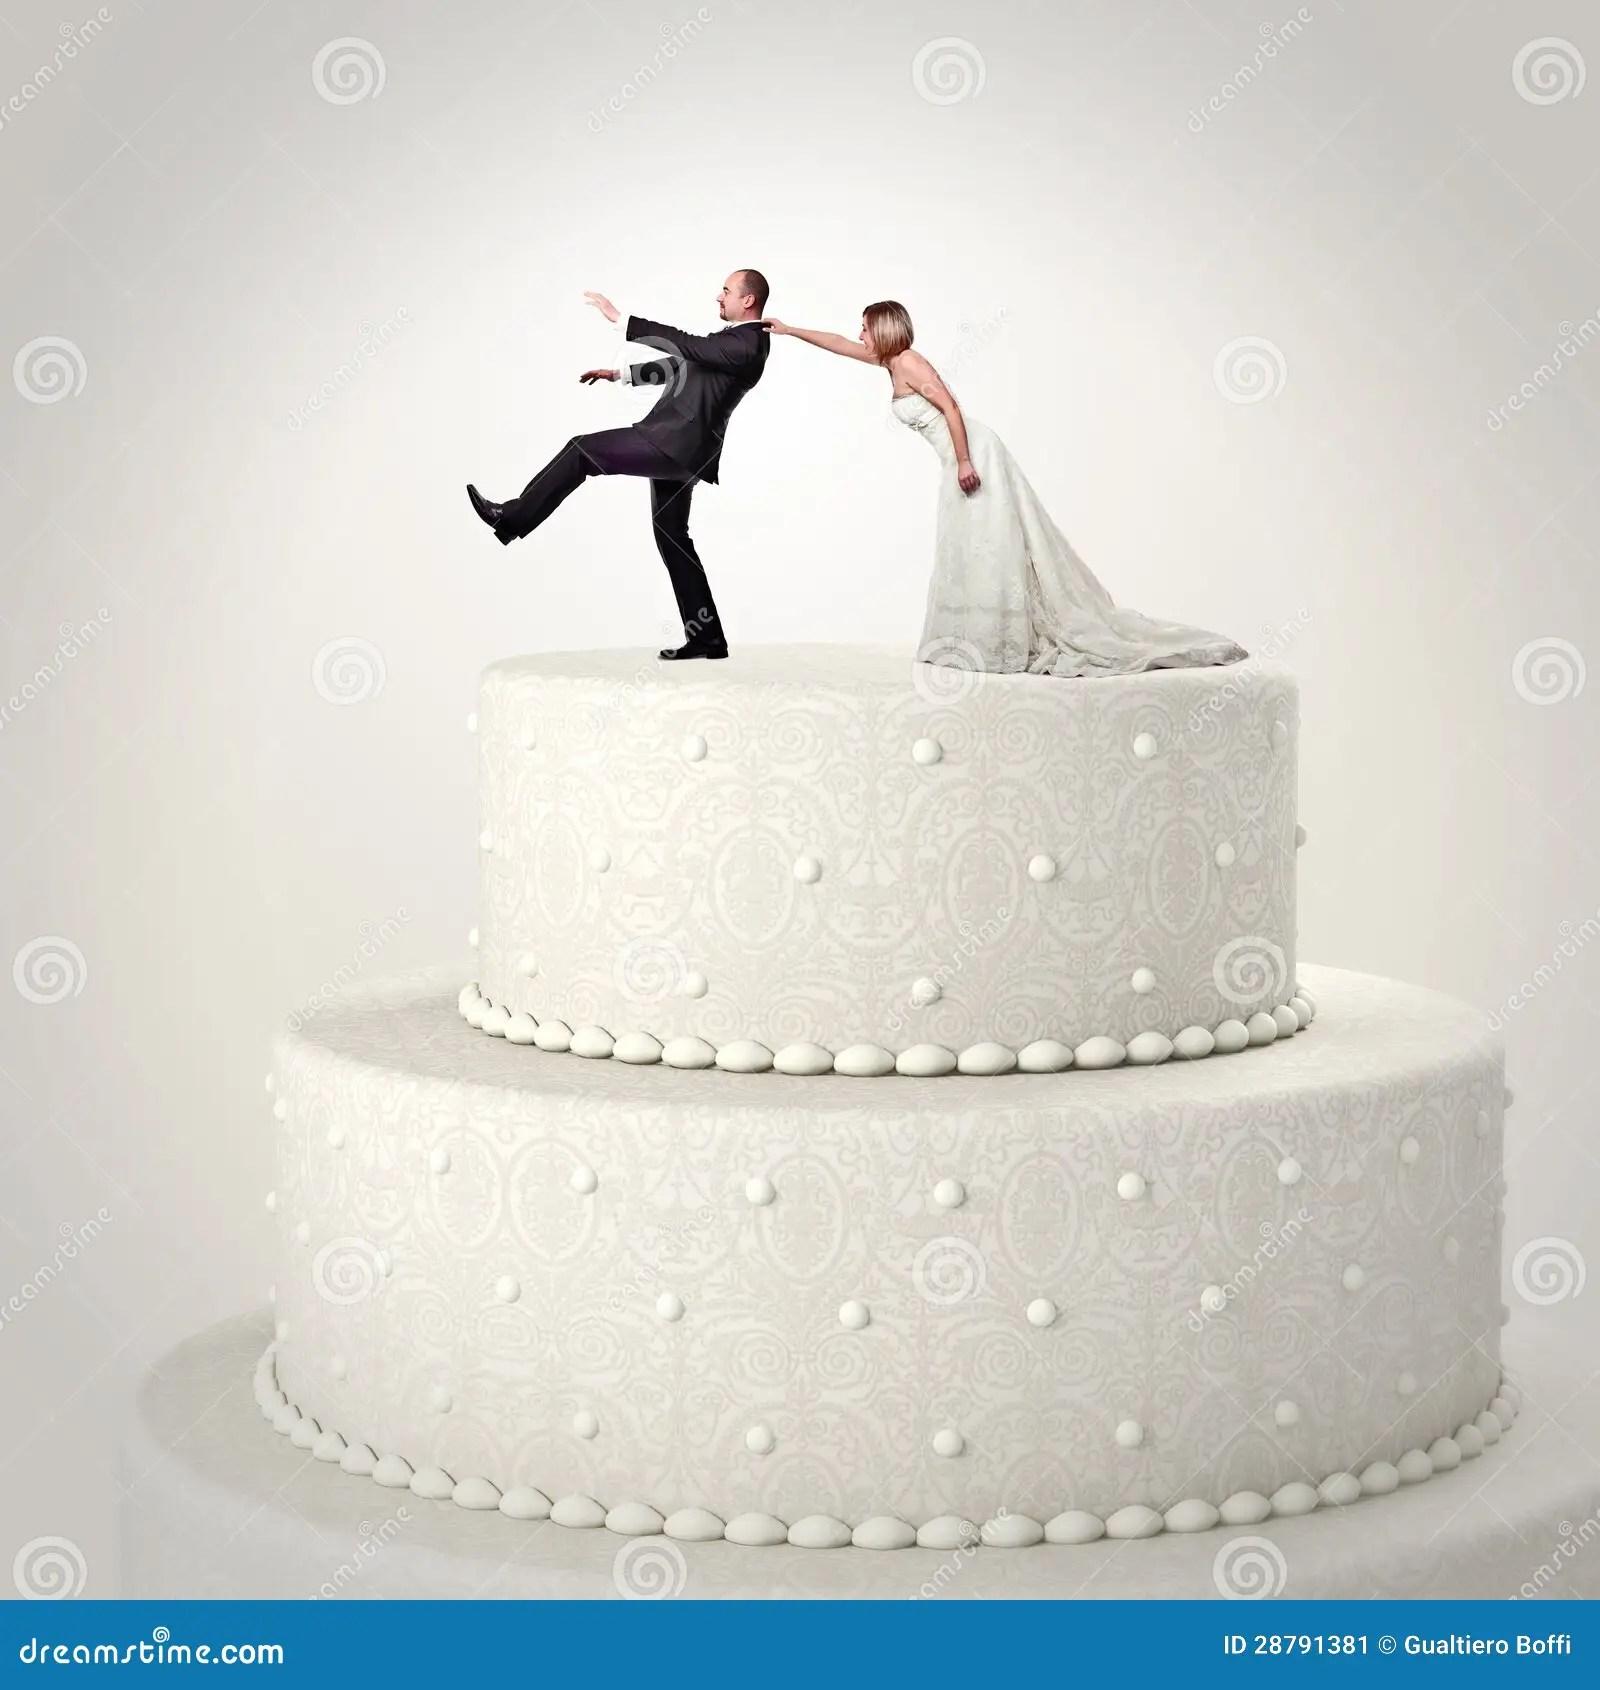 Cake Decorations Men